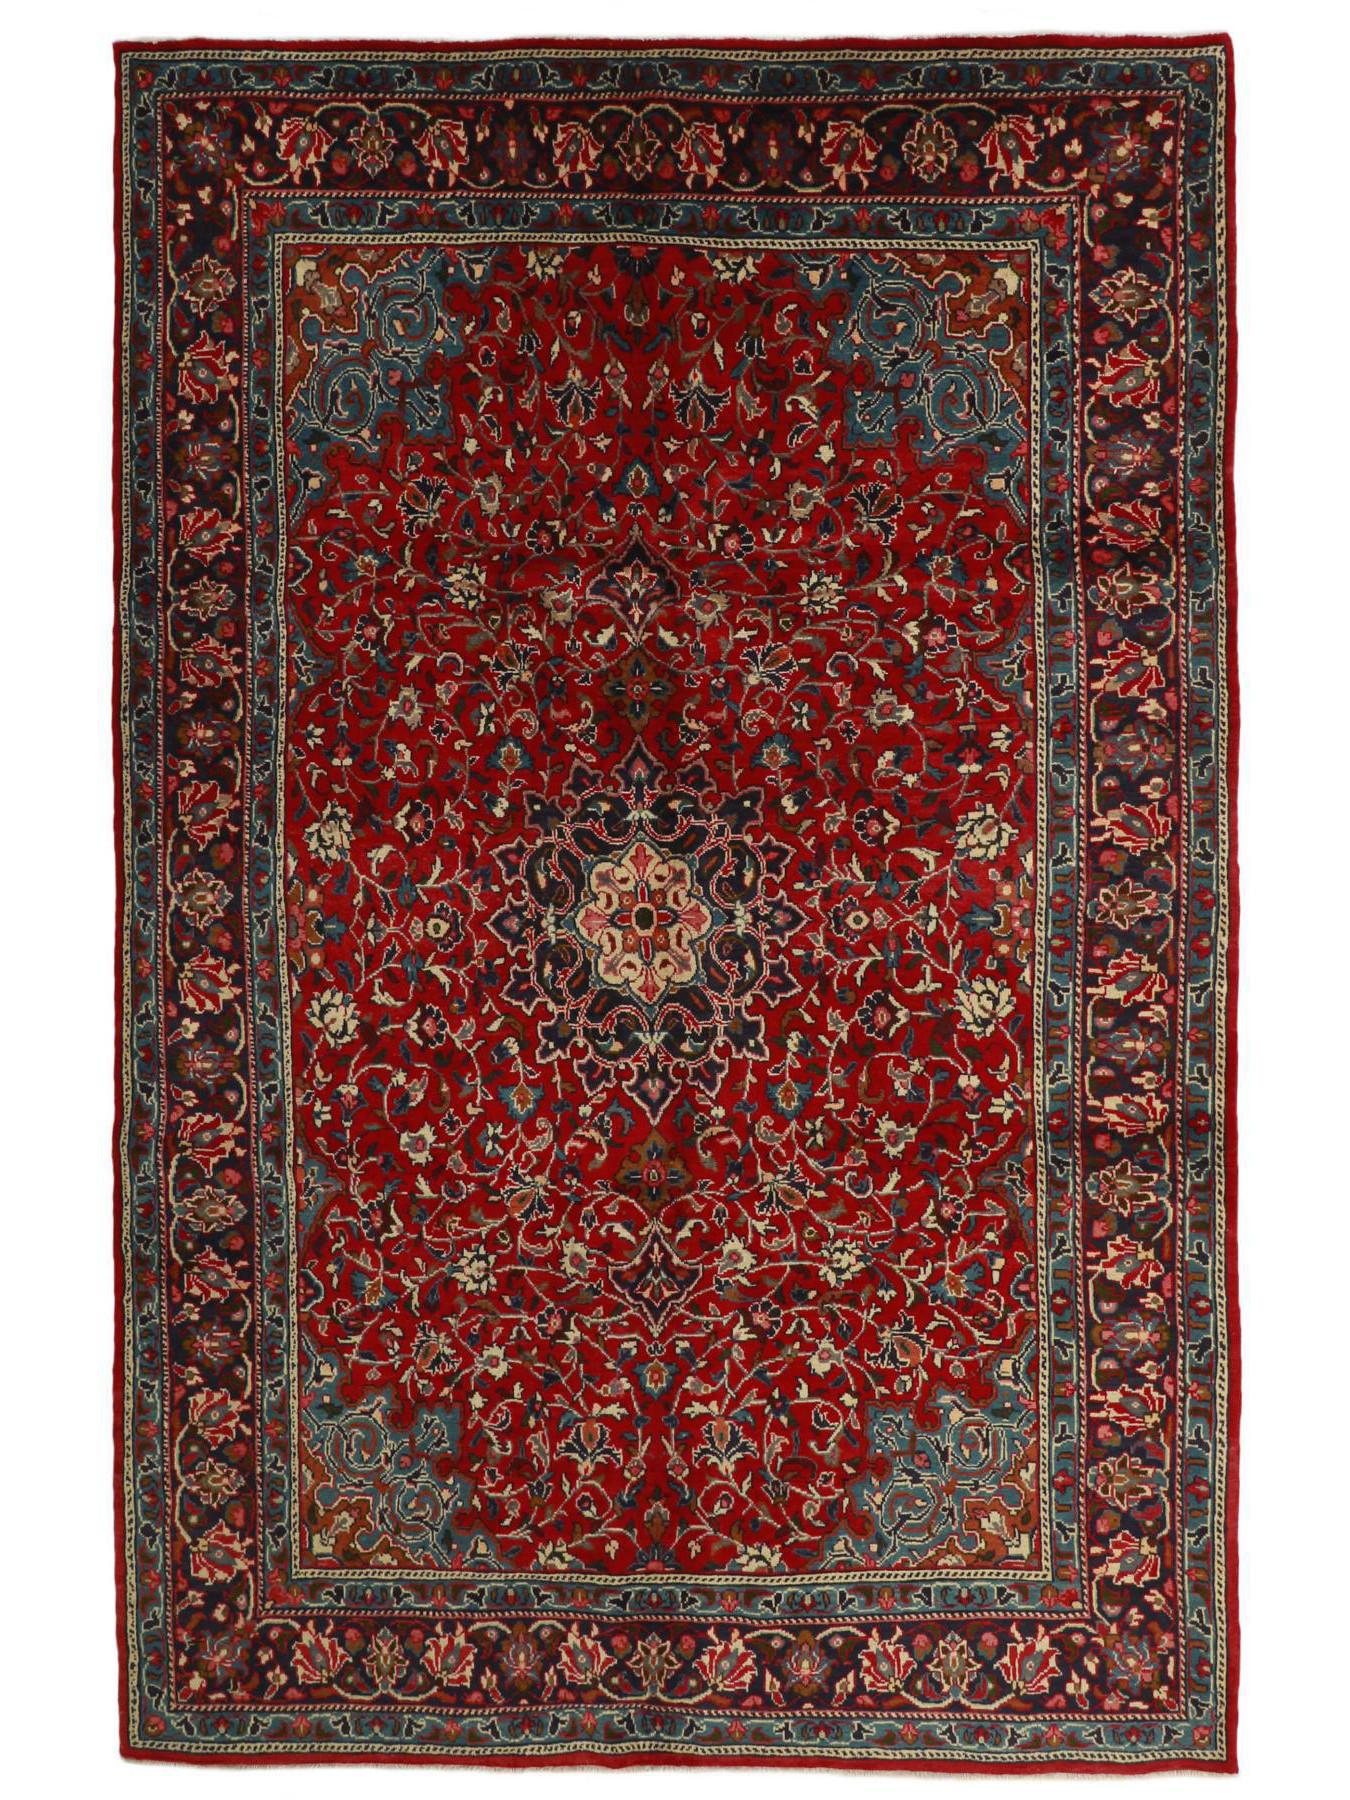 Tapis persans - Mahal